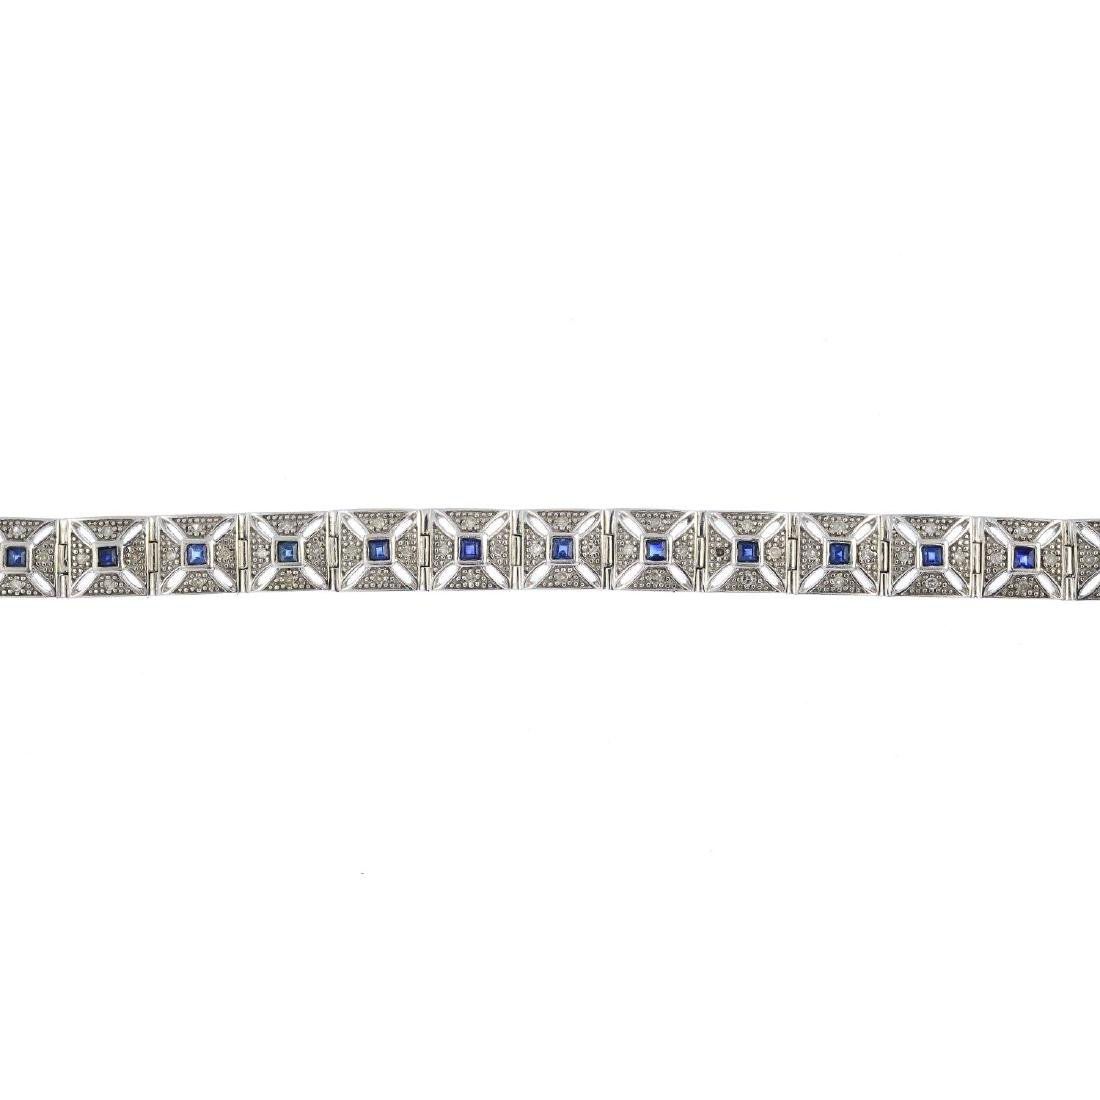 A diamond and sapphire bracelet. Designed as a series